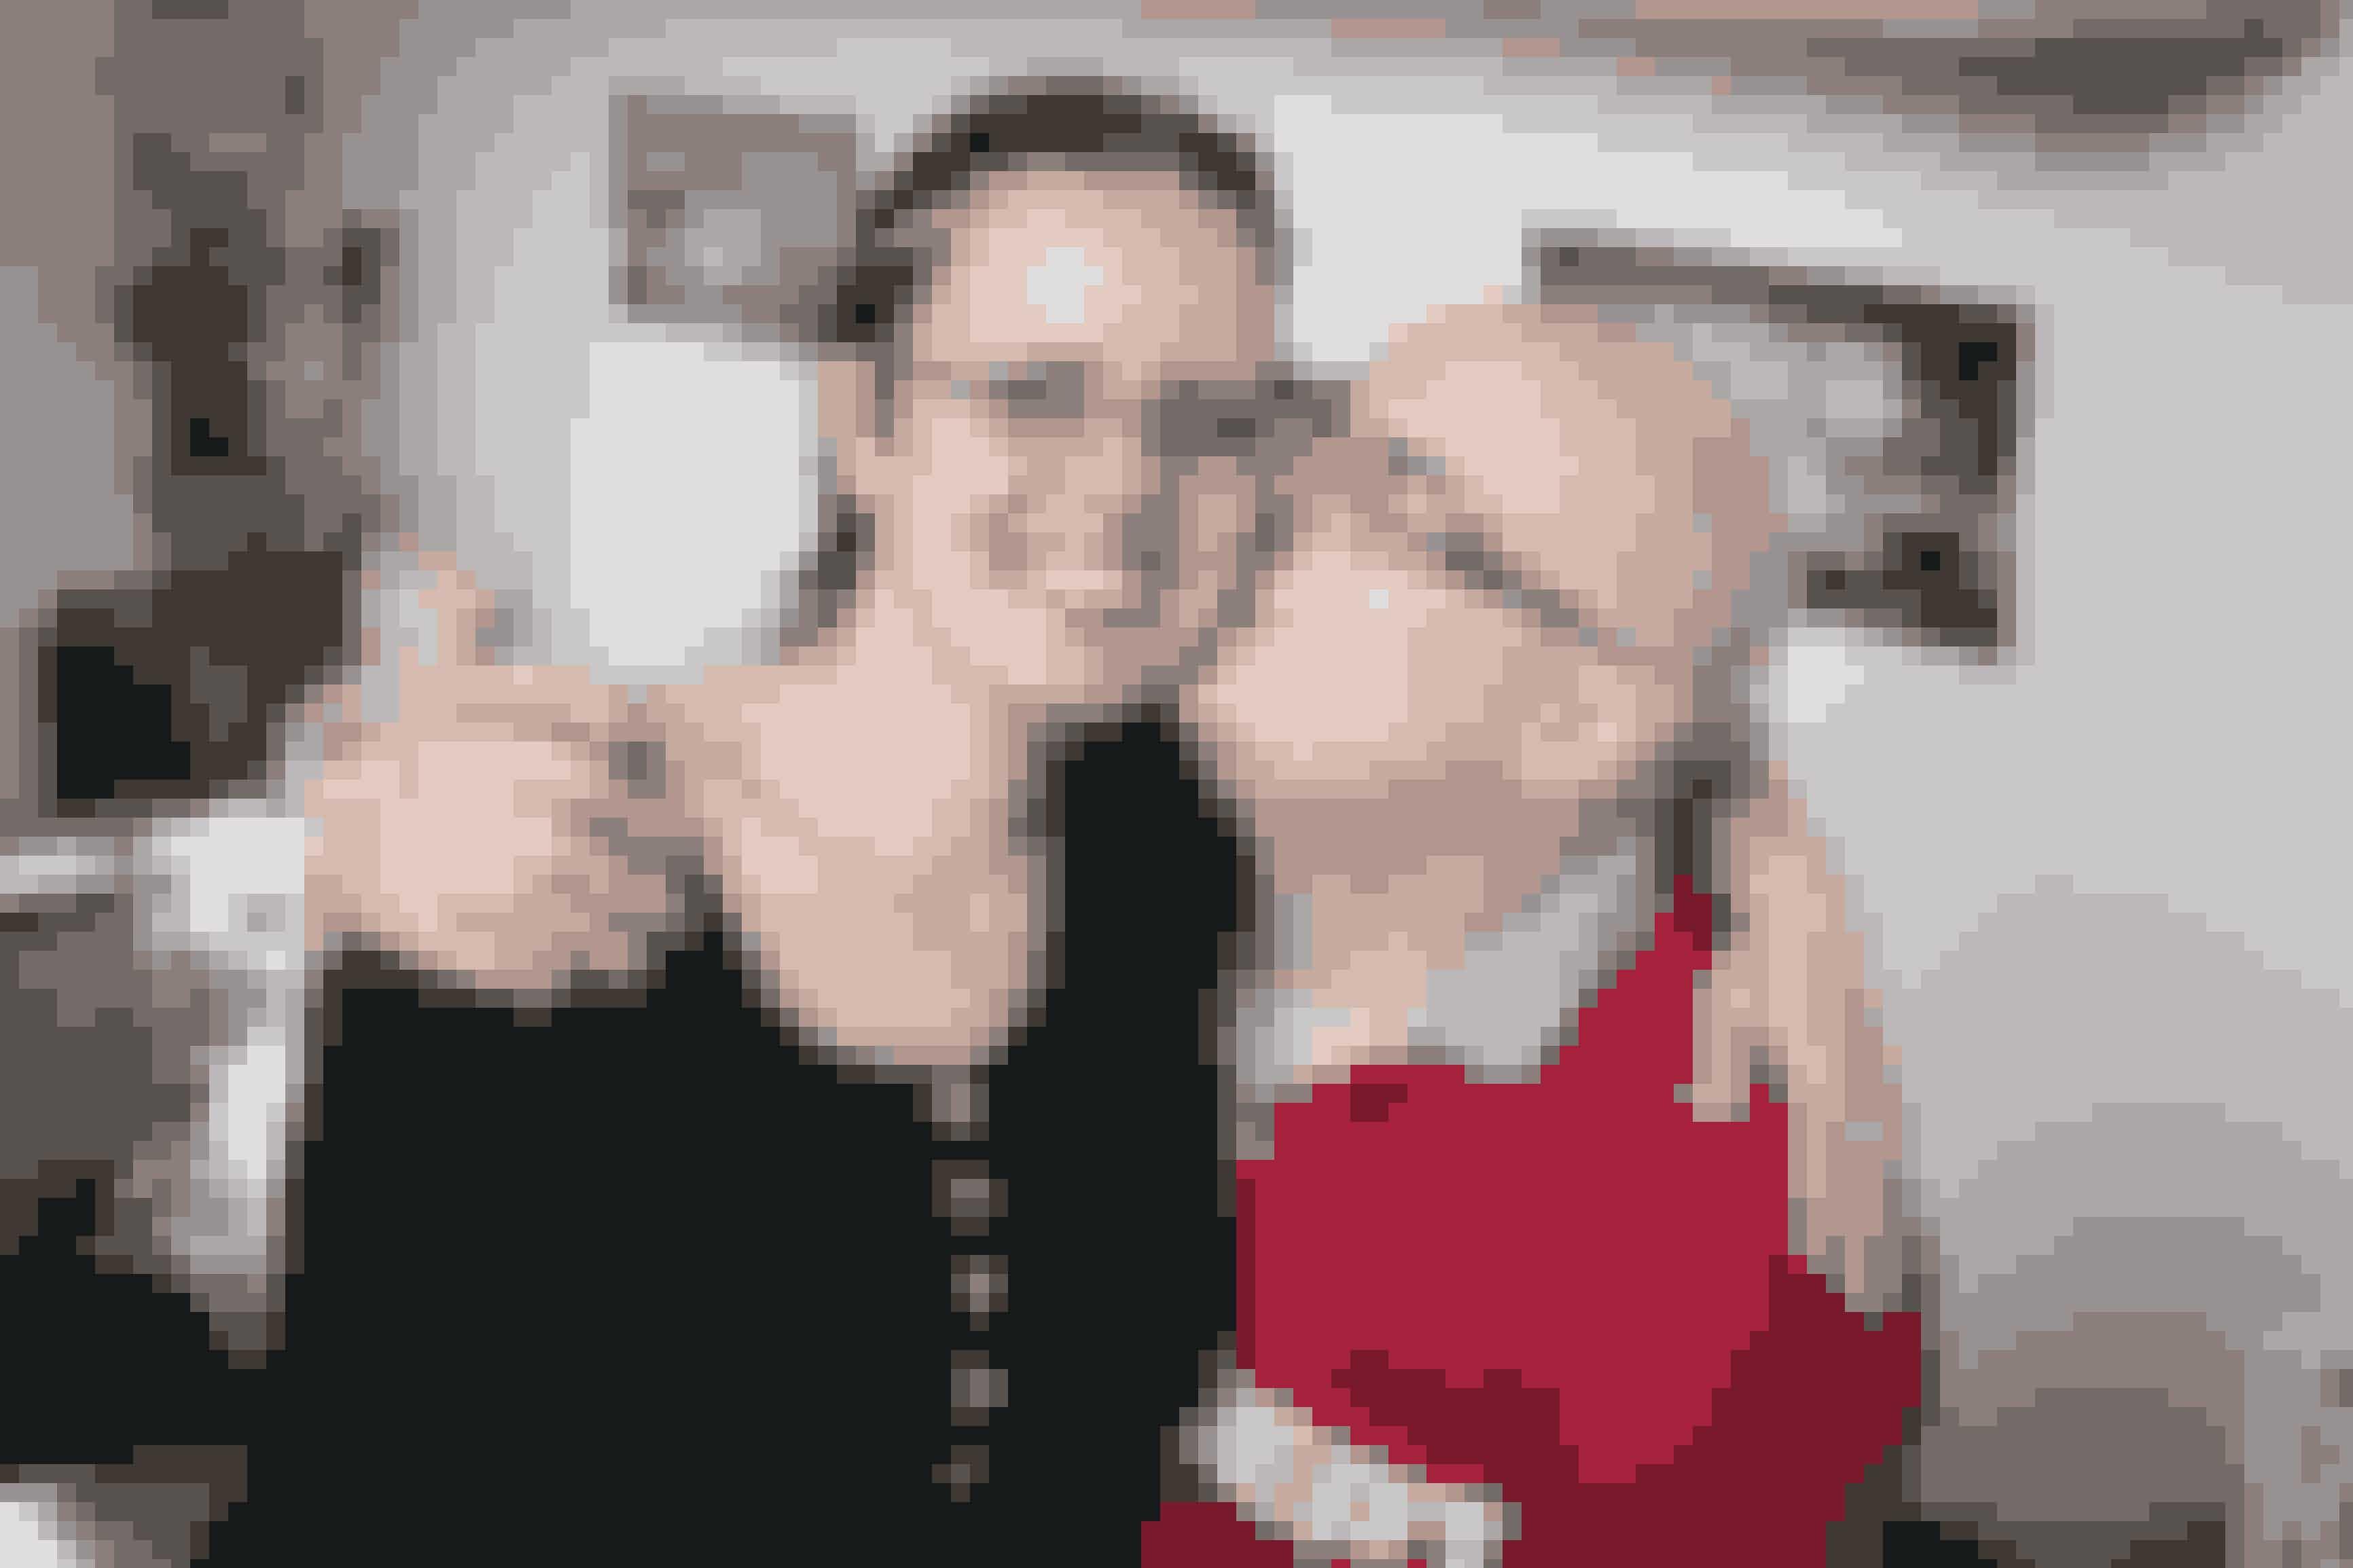 I dag er Lise og Carsten et fasttømret par og de griner begge over, hvor tilbageholde Lise var i starten.– I dag er jeg så glad for mit liv heroppe sammen med Carsten, lyder det fra Lise.